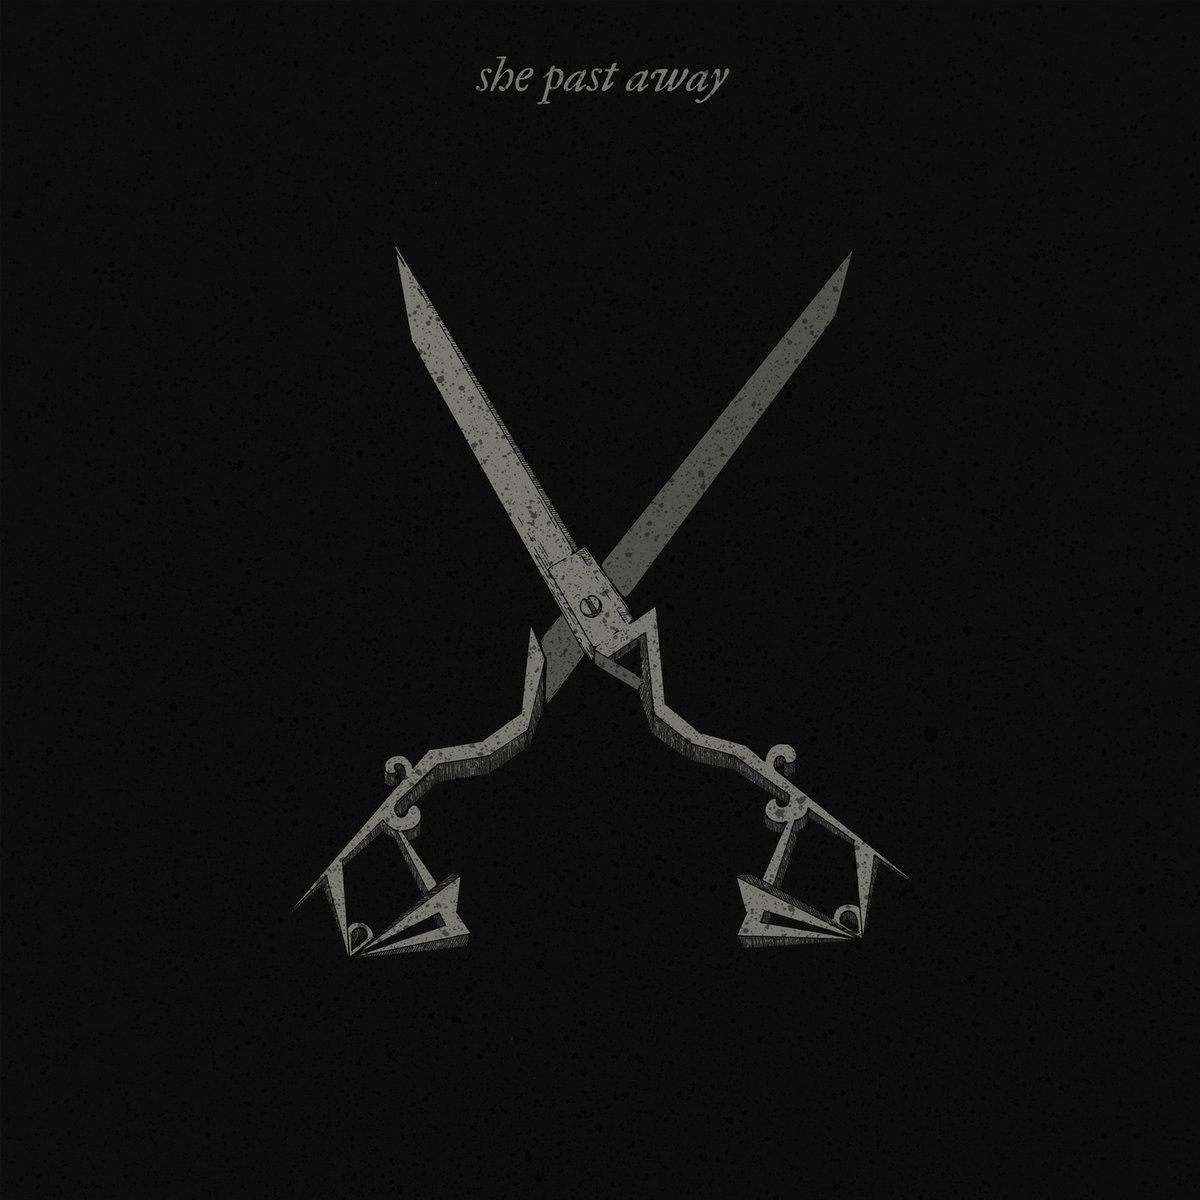 Post-punk shivers – She Past Away – X